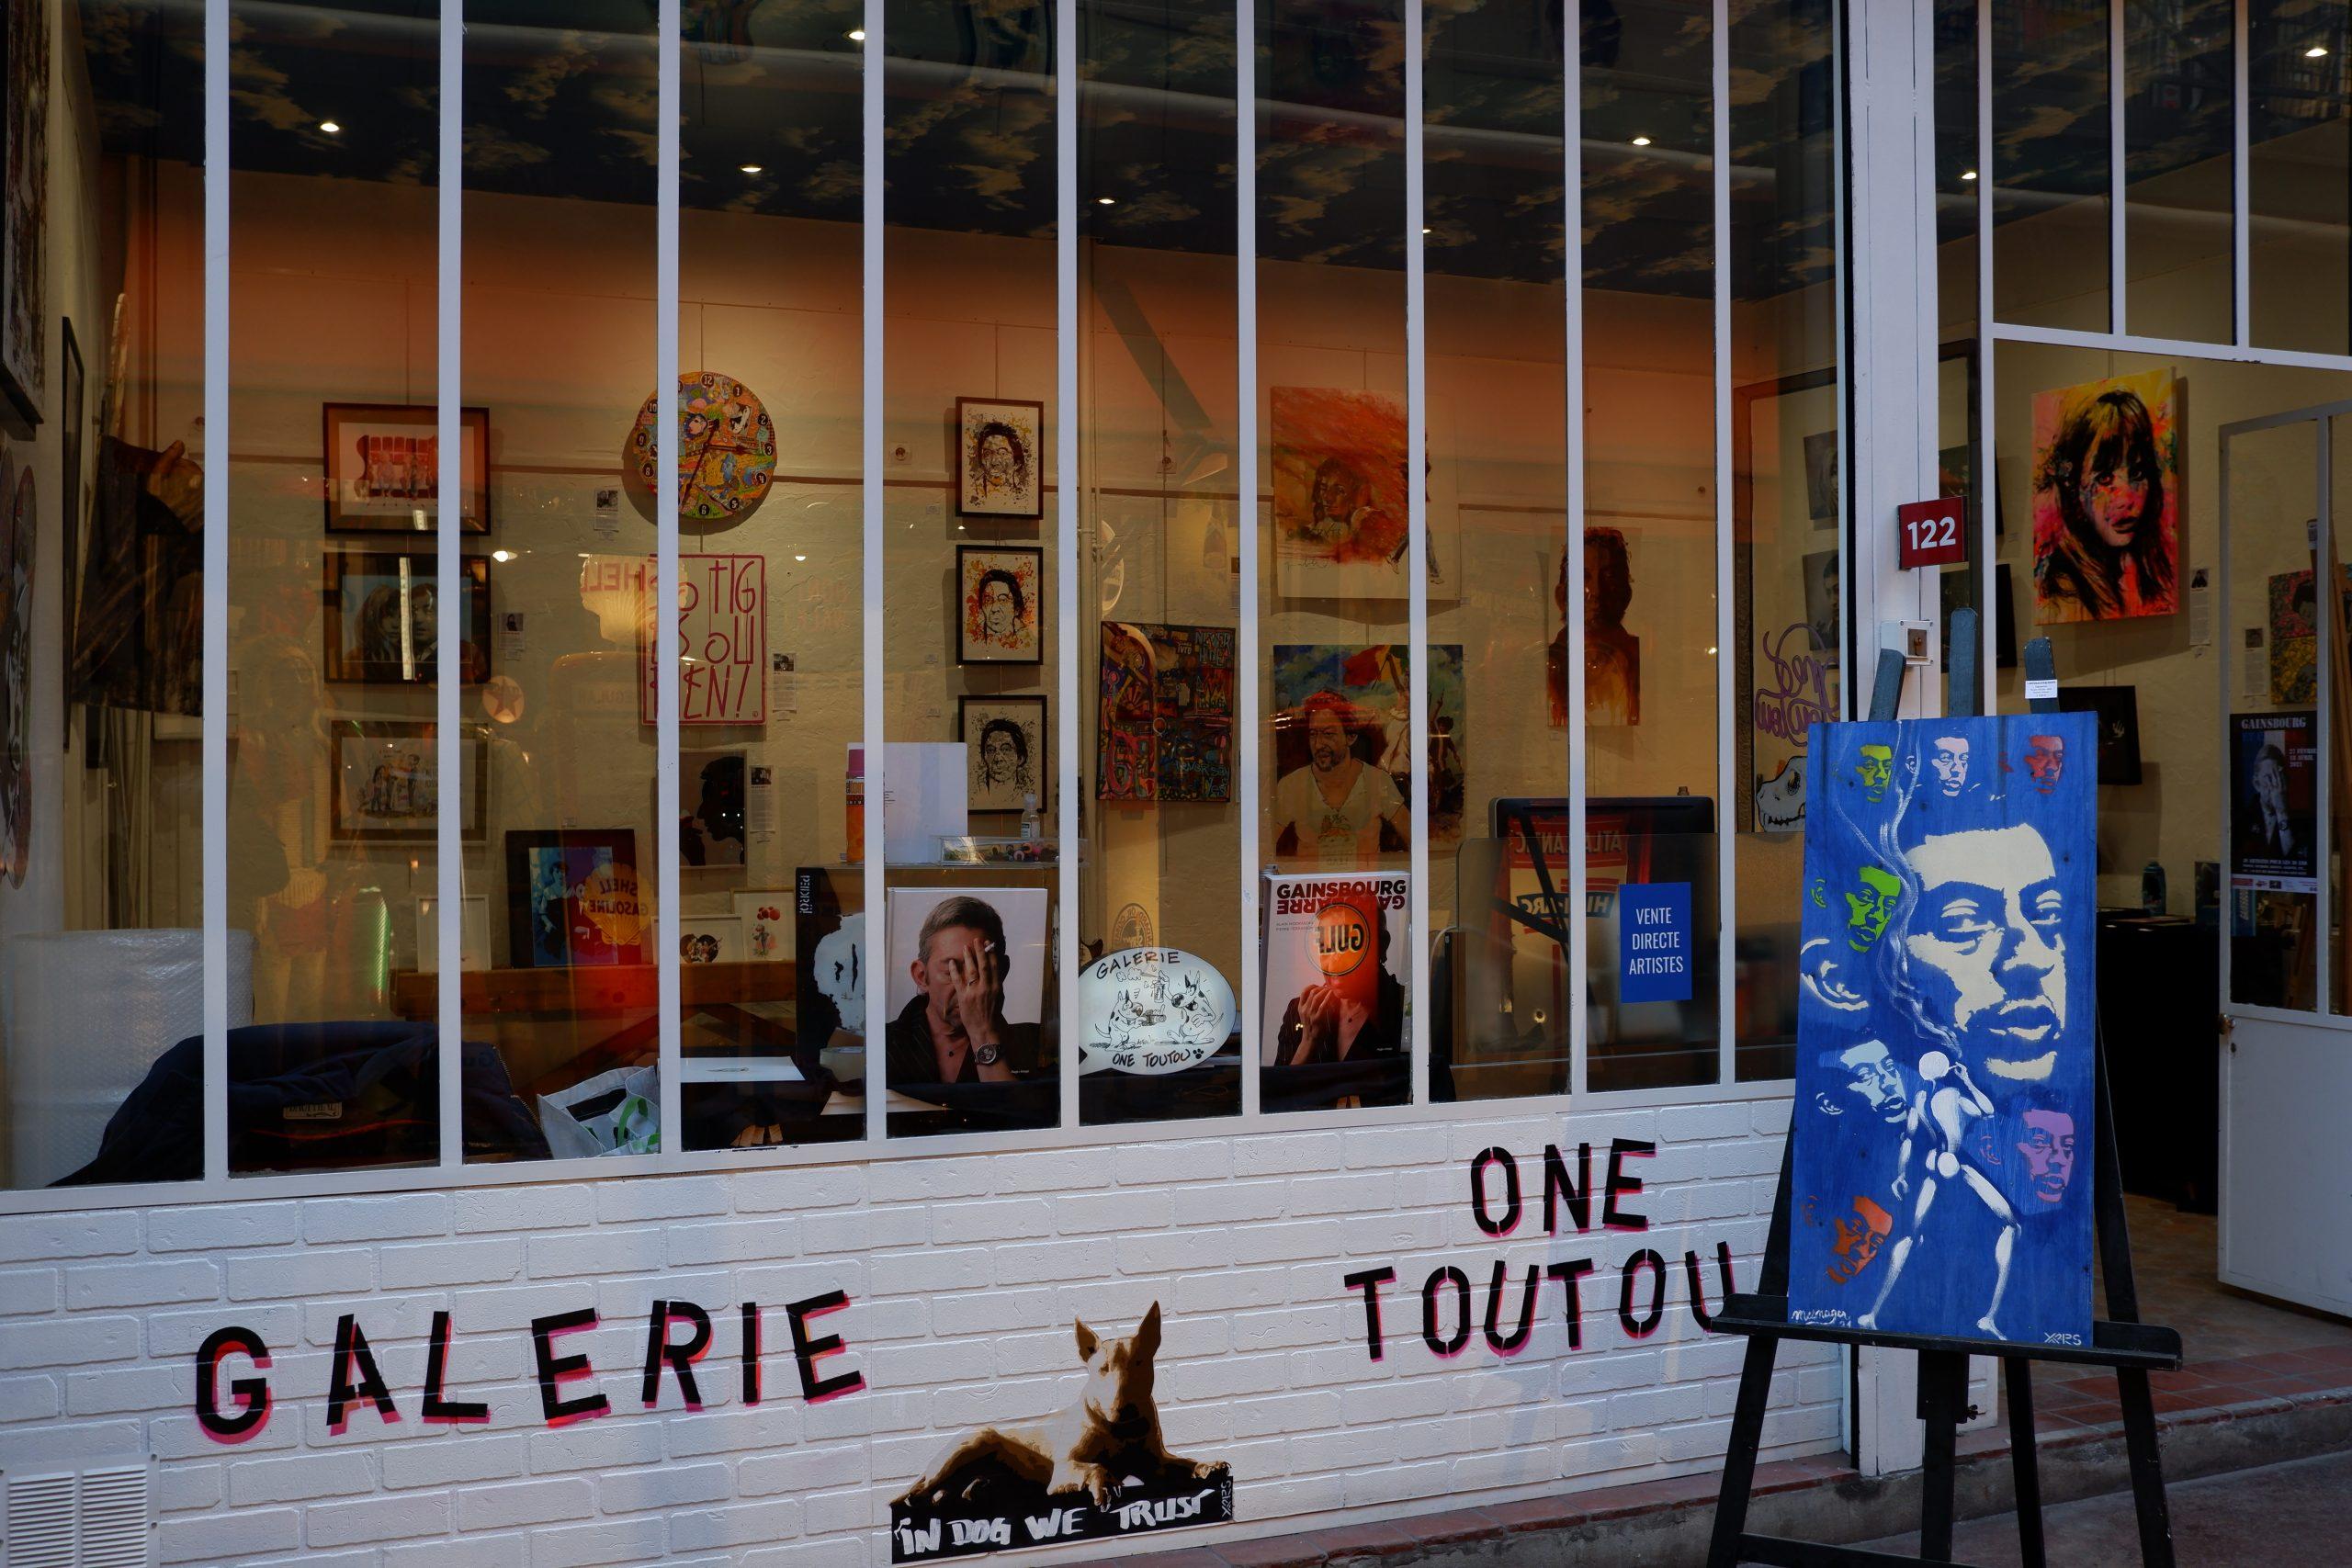 Devanture Galerie One Toutou - ©nofakeinmynews.com